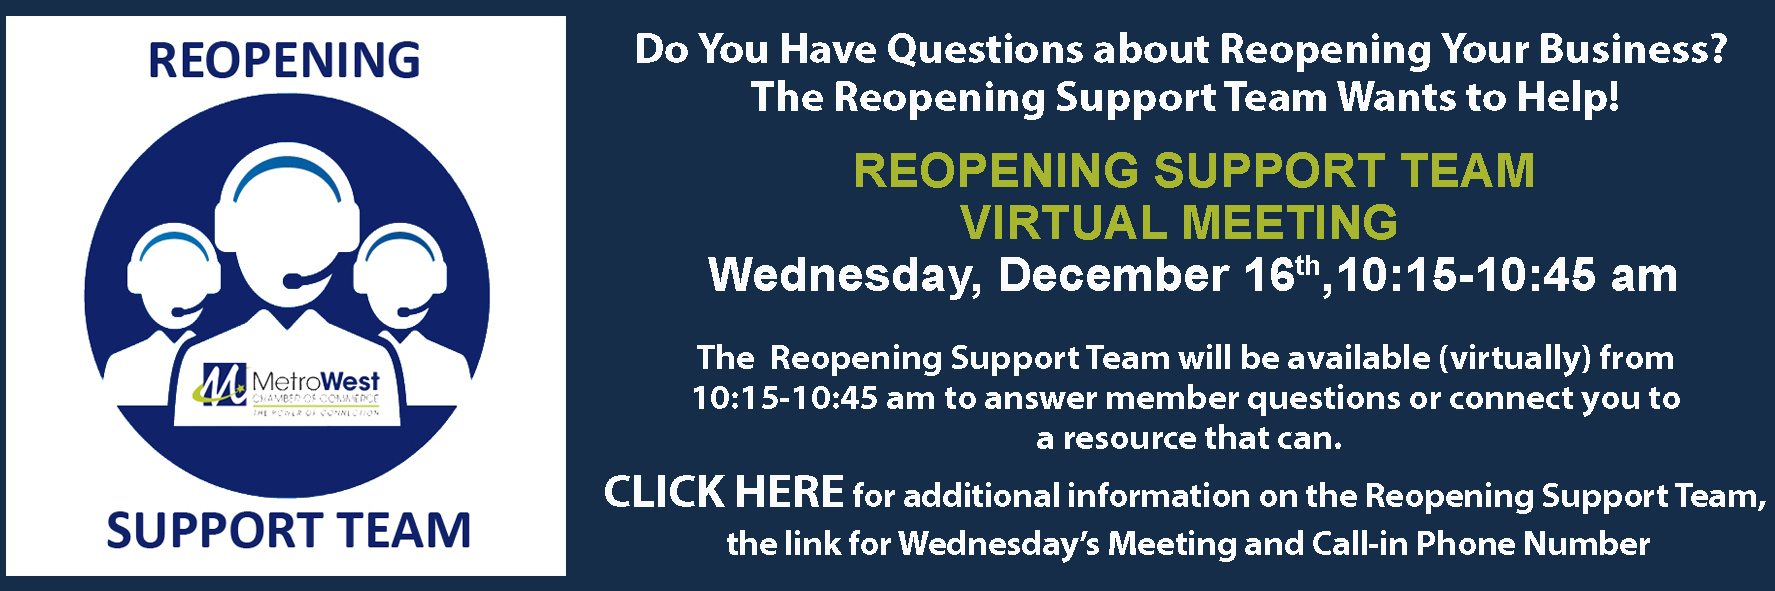 Reopening-Support-Team-12-16-2020-web-Slider.jpg